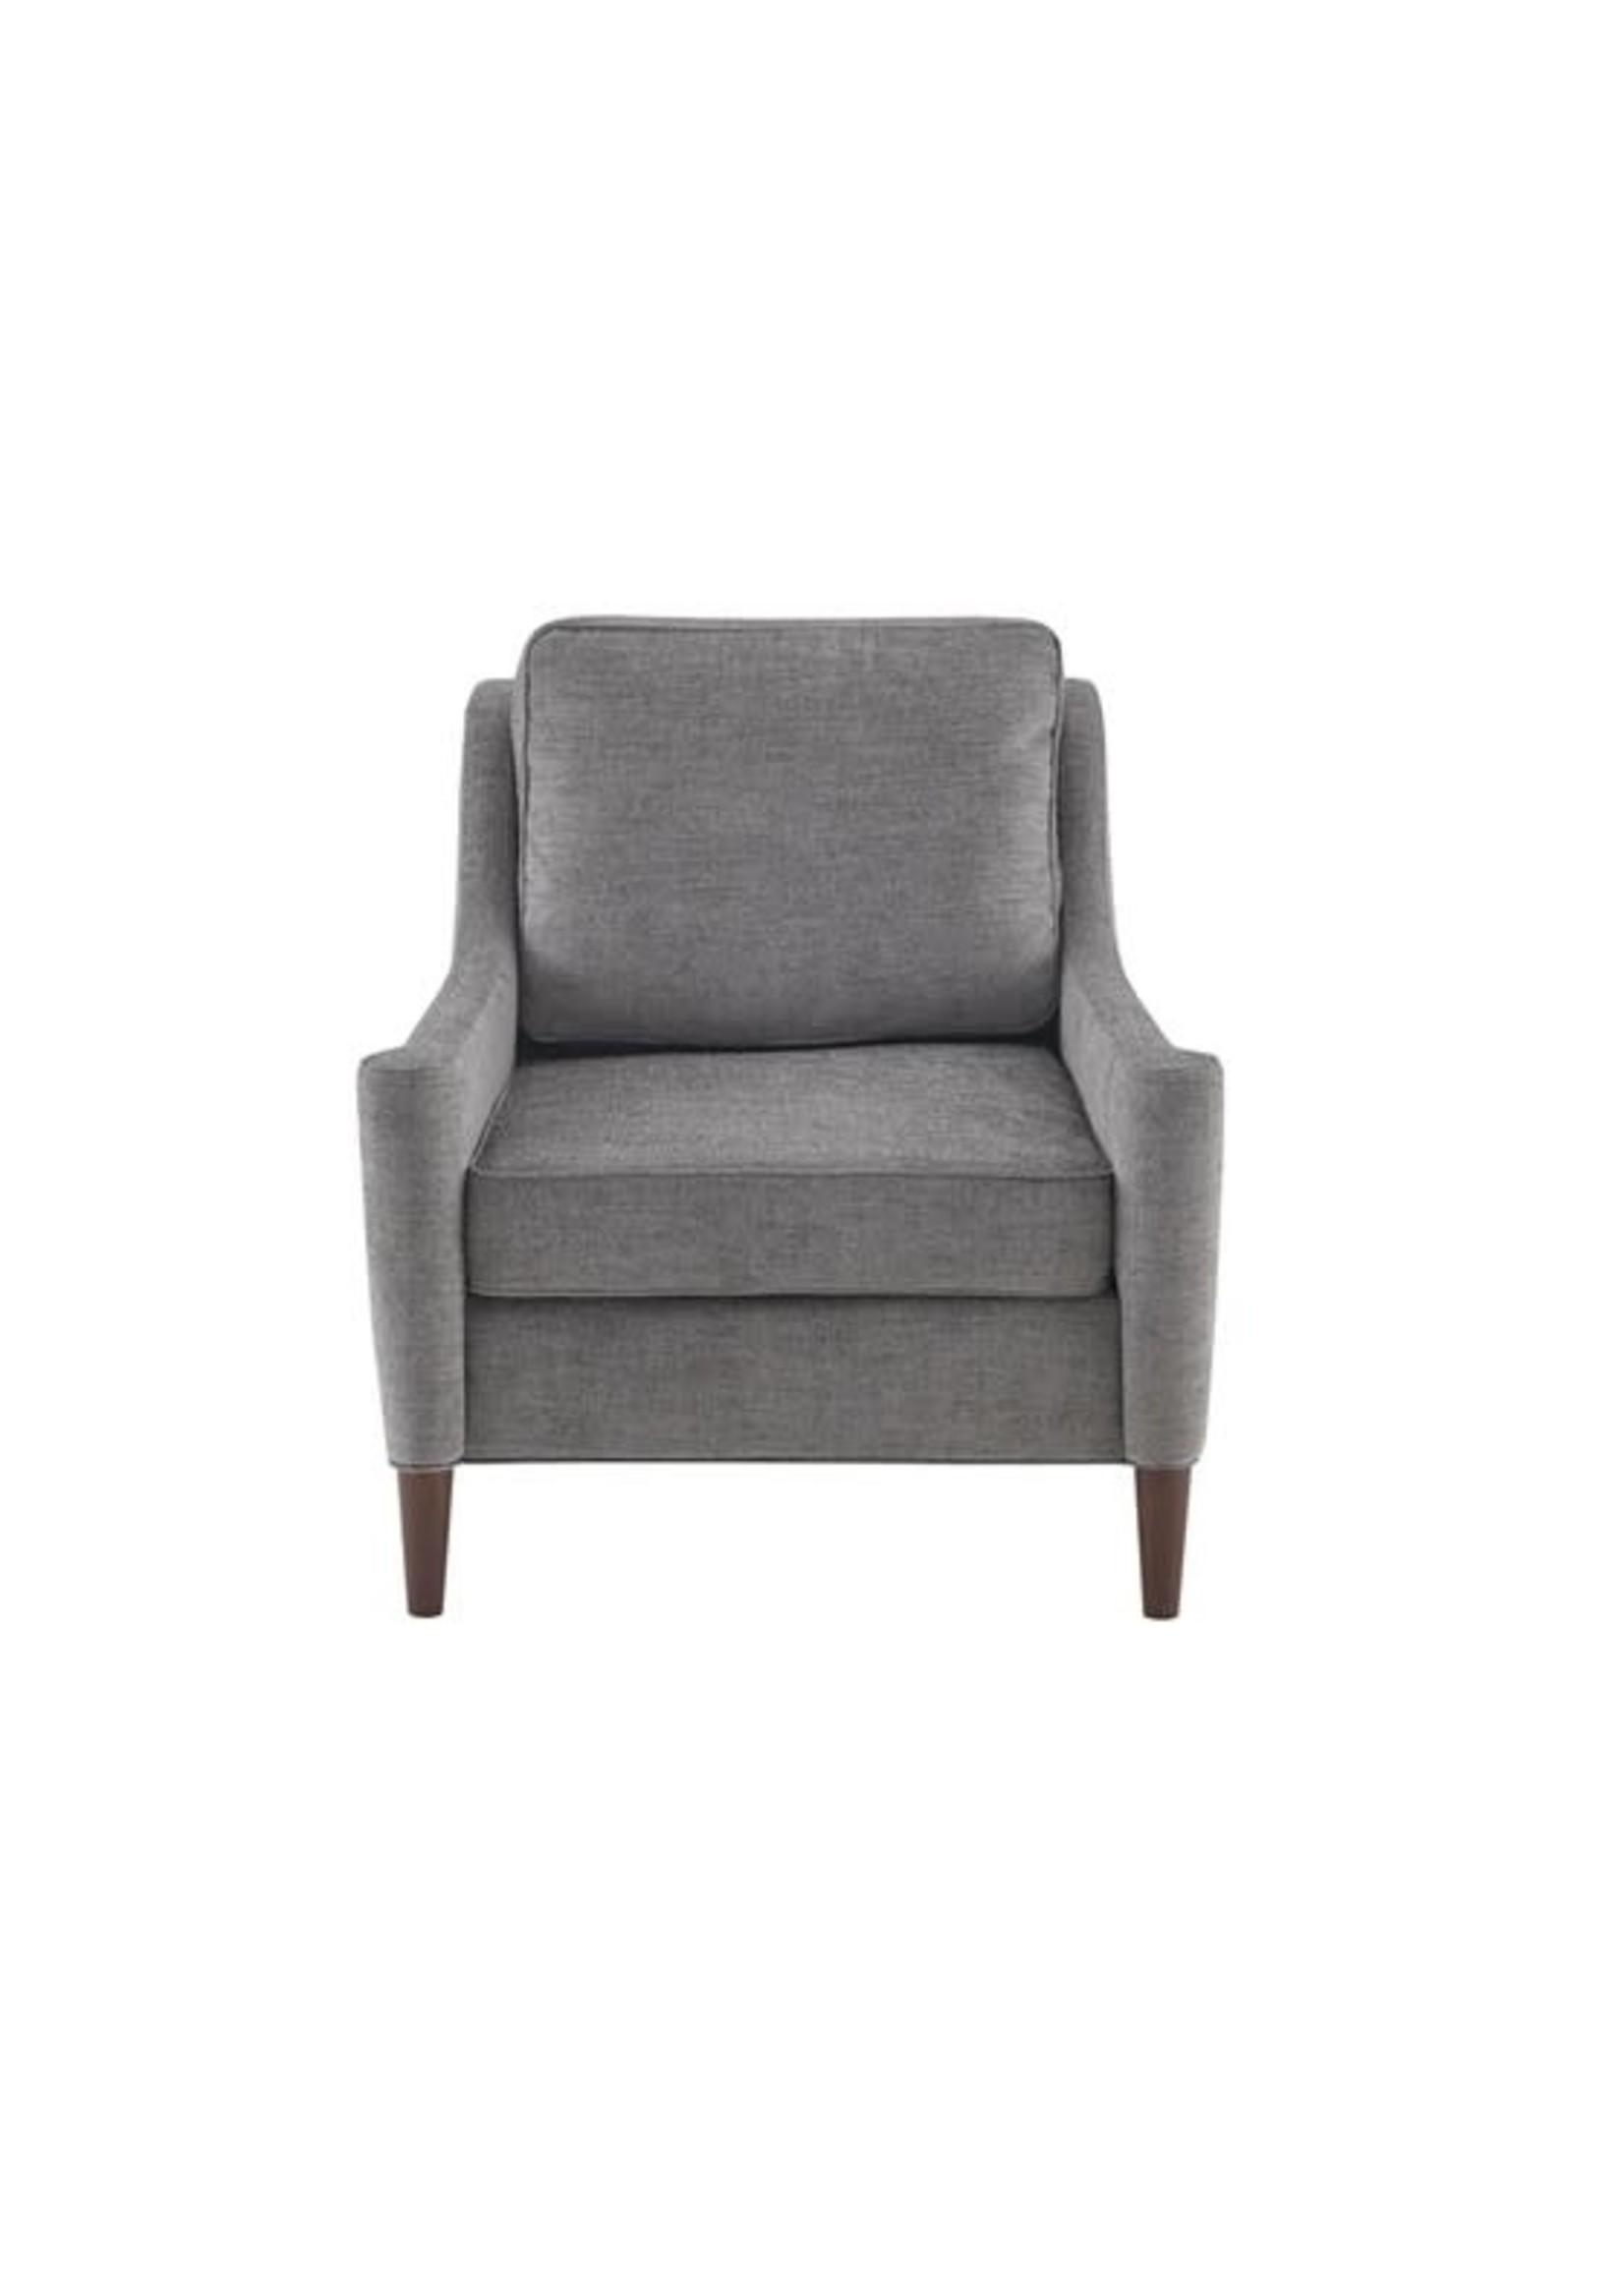 Olliix OLLIIX Windsor Lounge Chair Grey